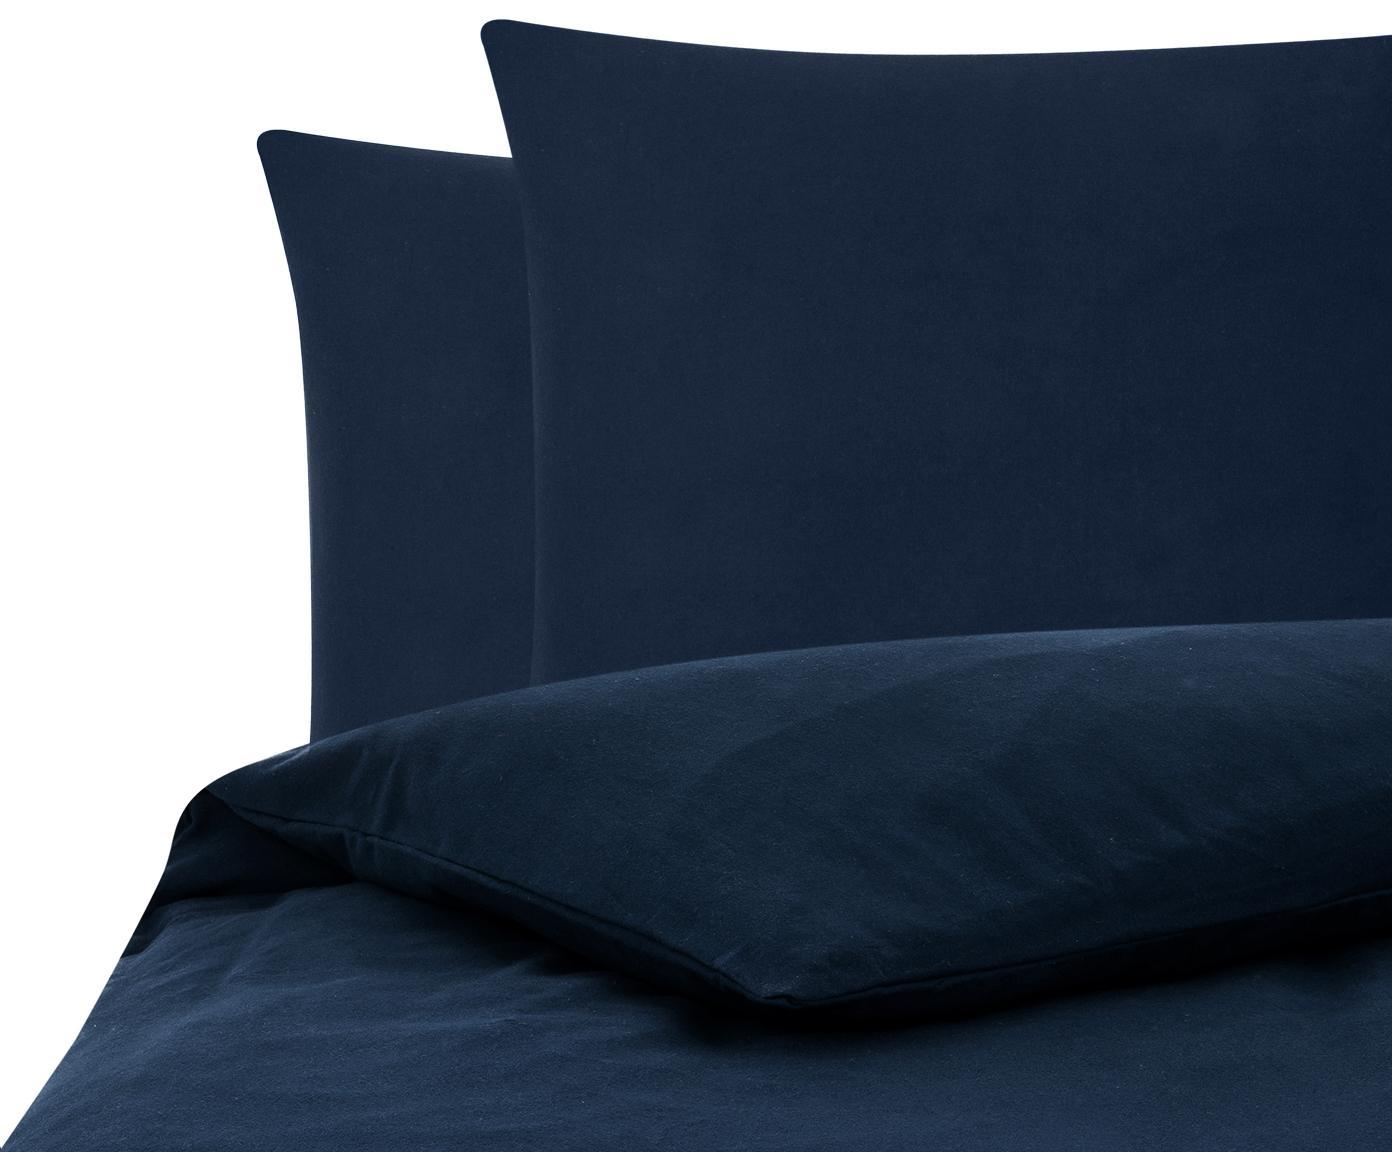 Flanell-Bettwäsche Biba in Navyblau, Webart: Flanell Flanell ist ein s, Navyblau, 200 x 200 cm + 2 Kissen 80 x 80 cm